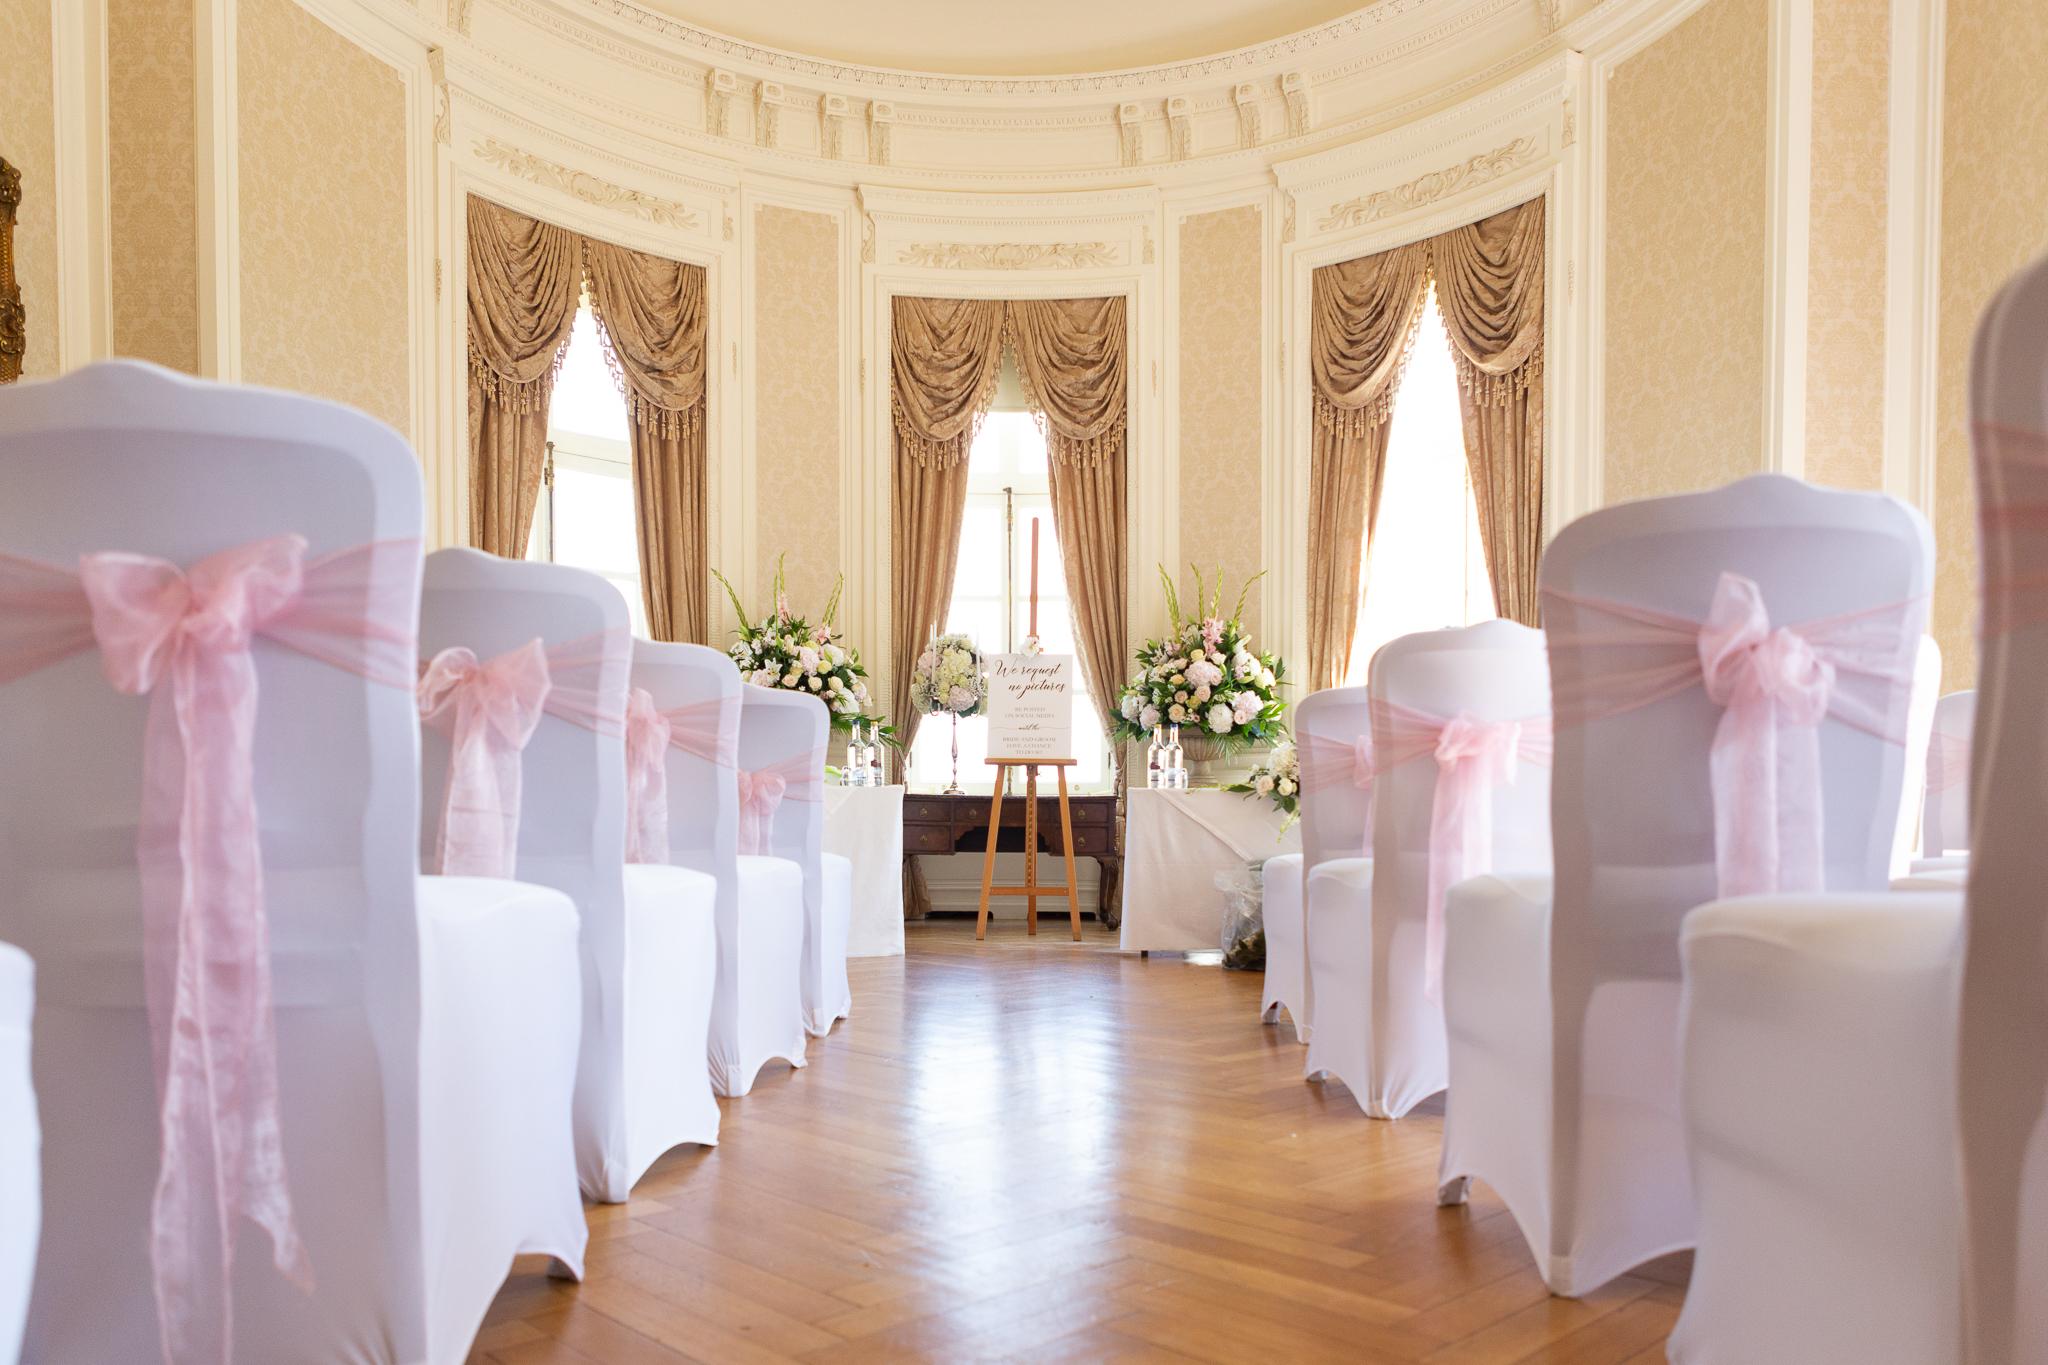 Luton_Hoo_Ceremony_natural_wedding_photography_Rachel_Thornhill_Photographer